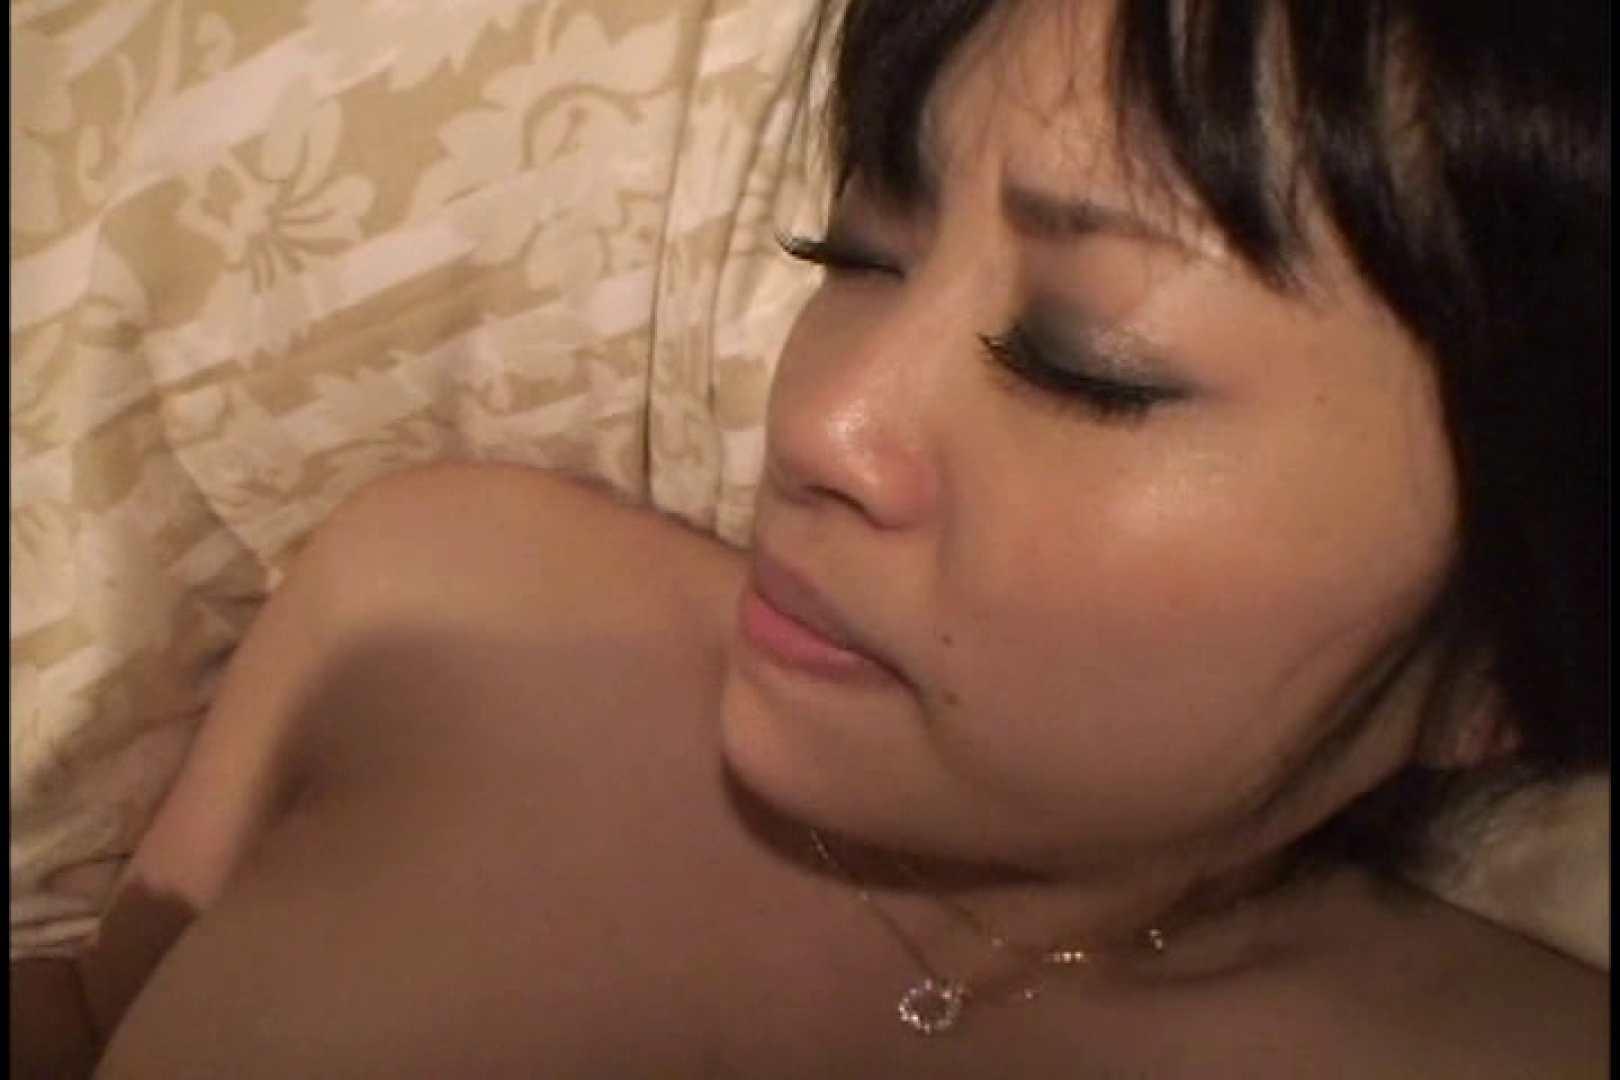 JDハンター全国ツアー vol.033 前編 女子大生ハメ撮り  22Pix 3